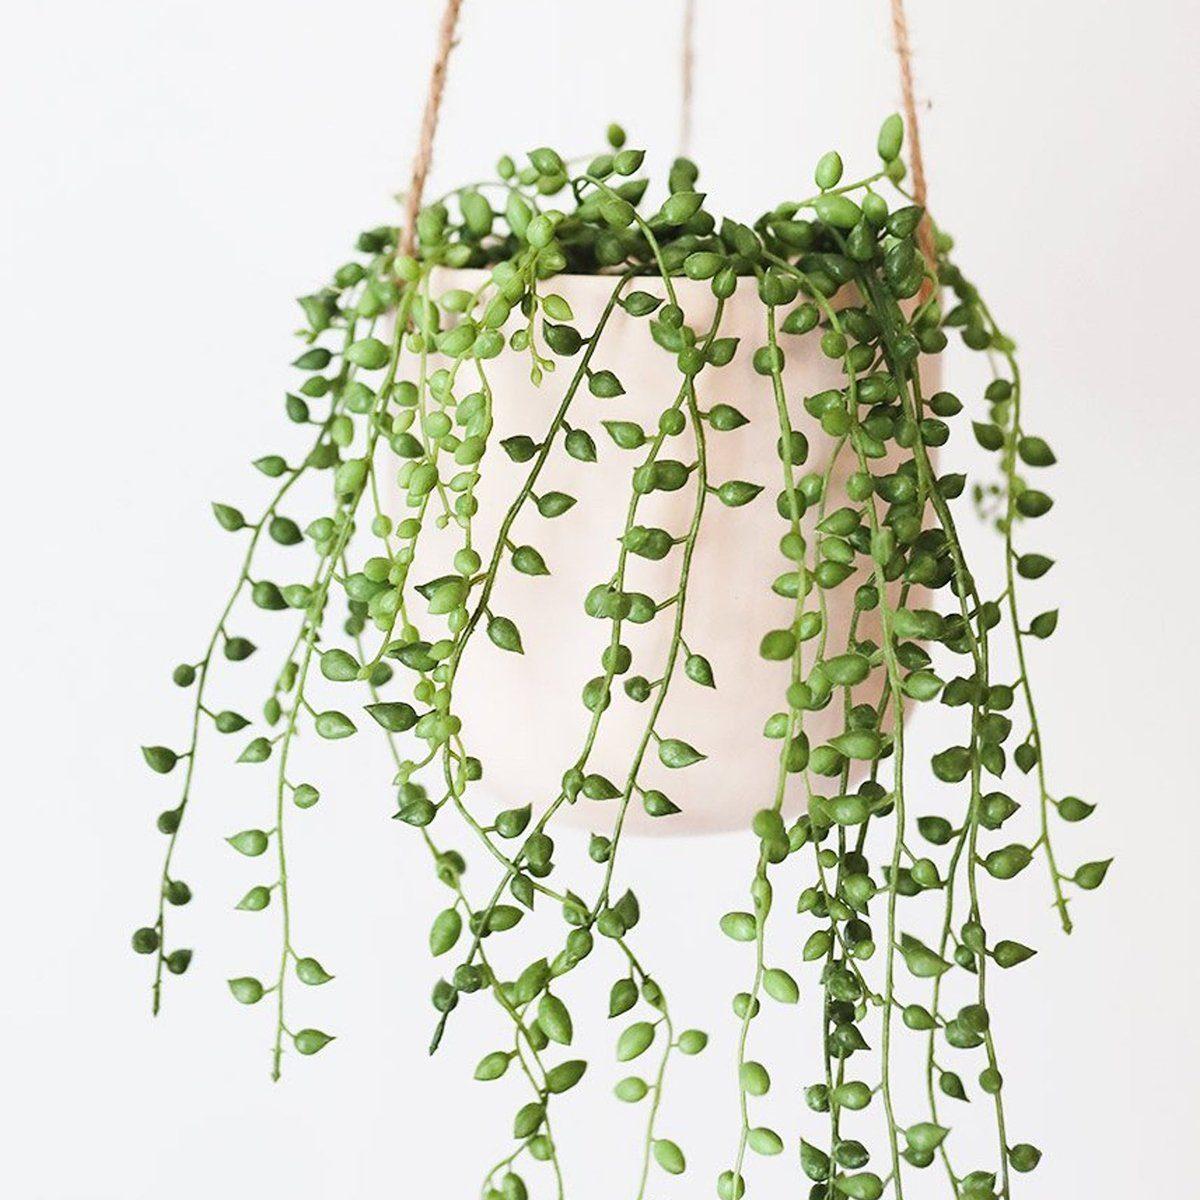 String of Pearls | 4 inch | Senecio Rowleyanus | Live Succulent Hanging Plant